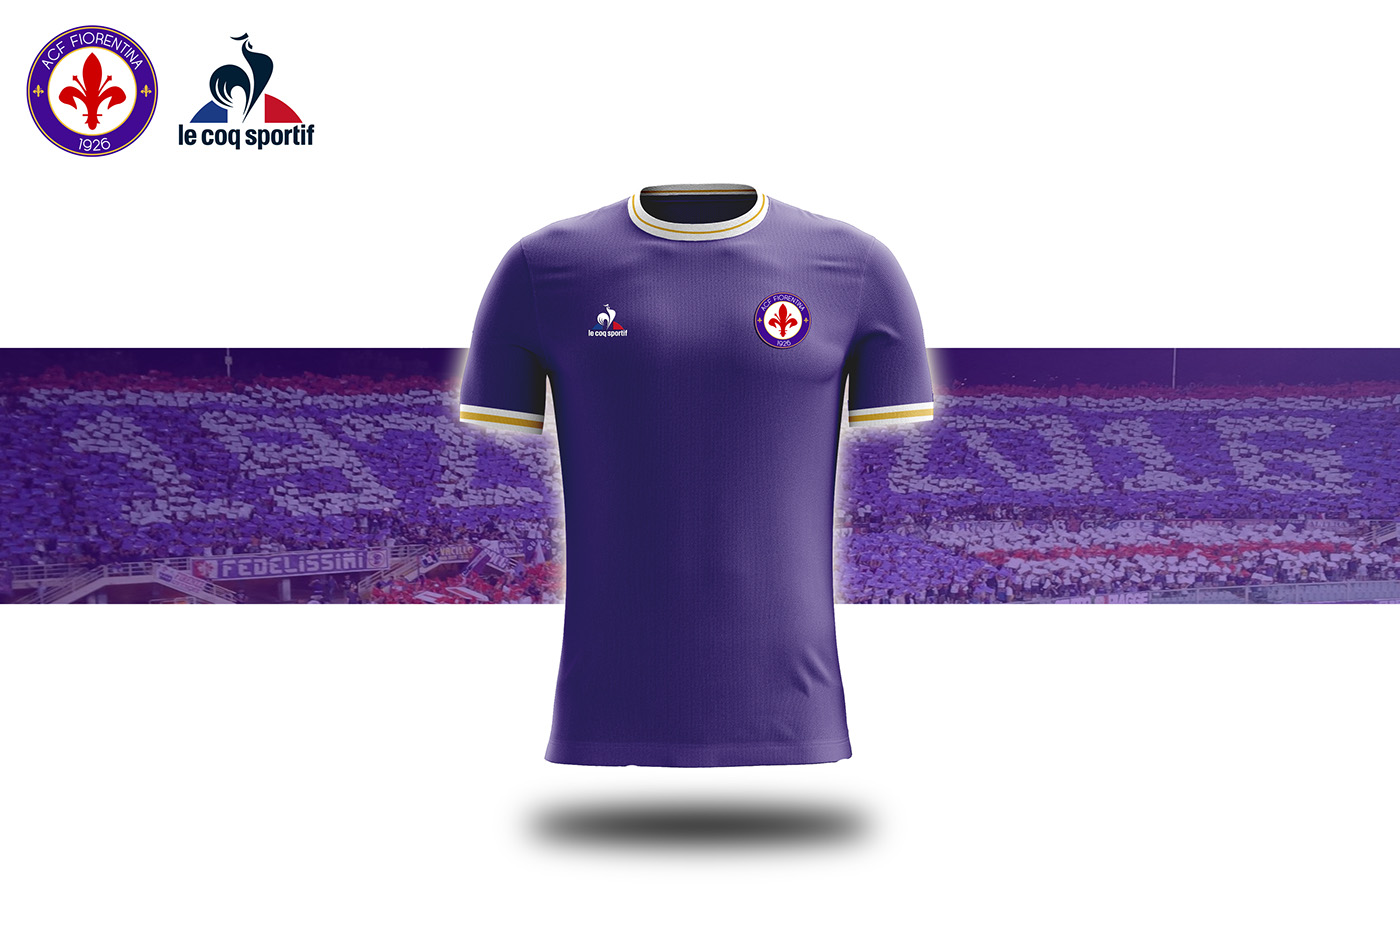 ACF Fiorentina AWAY KIT 2017-2018. ACF Fiorentina THIRD KIT 2017-2018.  ADVERTISING. Thanks. Save to Collection. Follow Following Unfollow bc8dfcf05